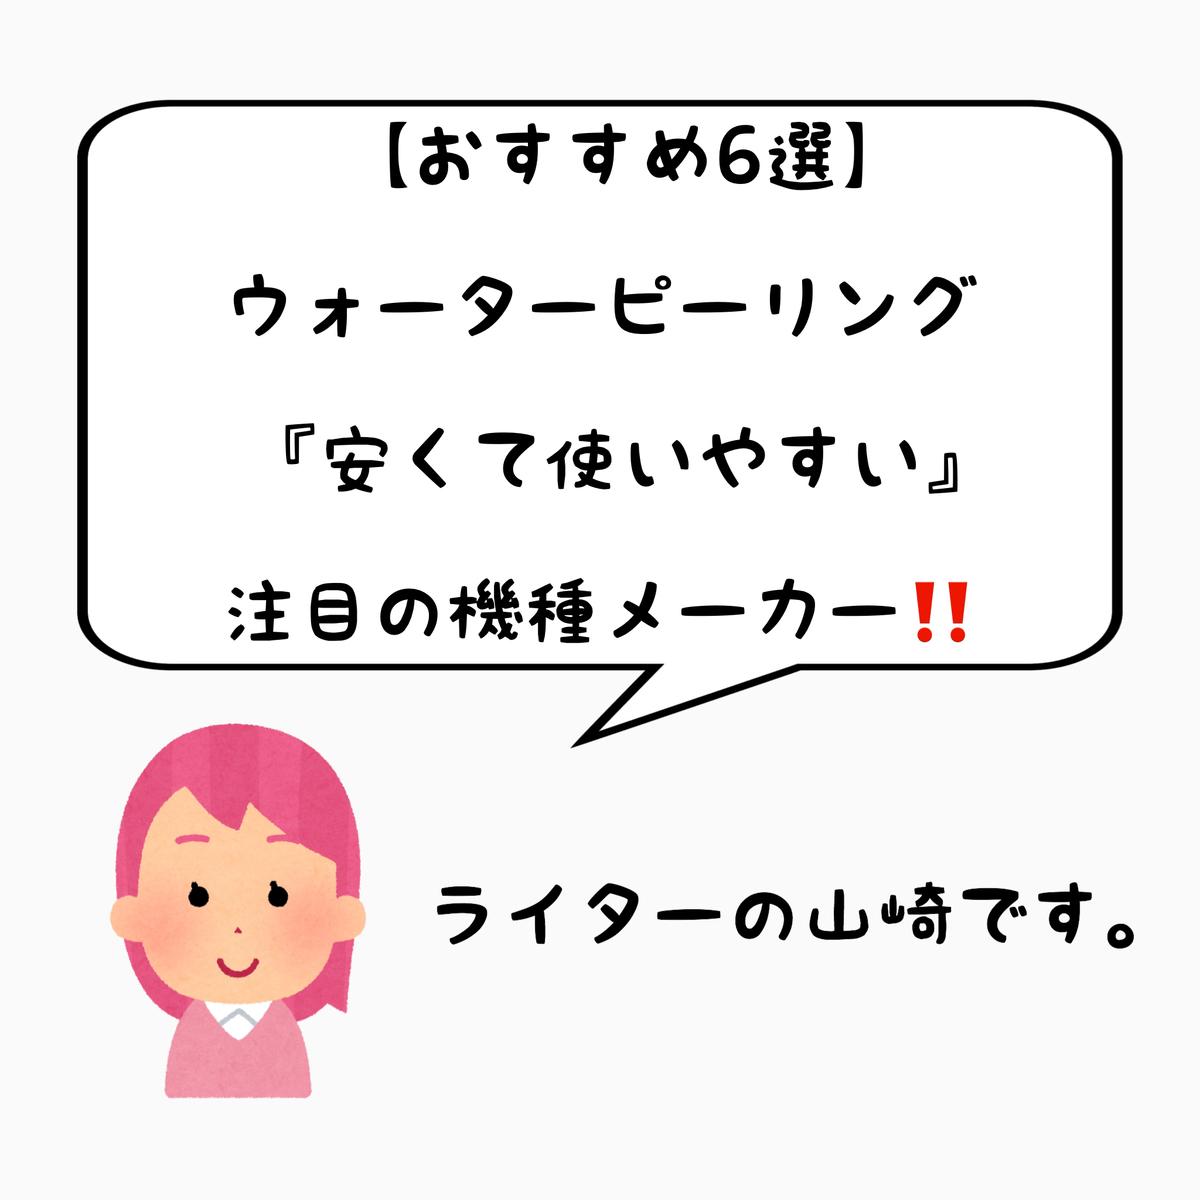 f:id:nokonoko_o:20201201133902j:plain